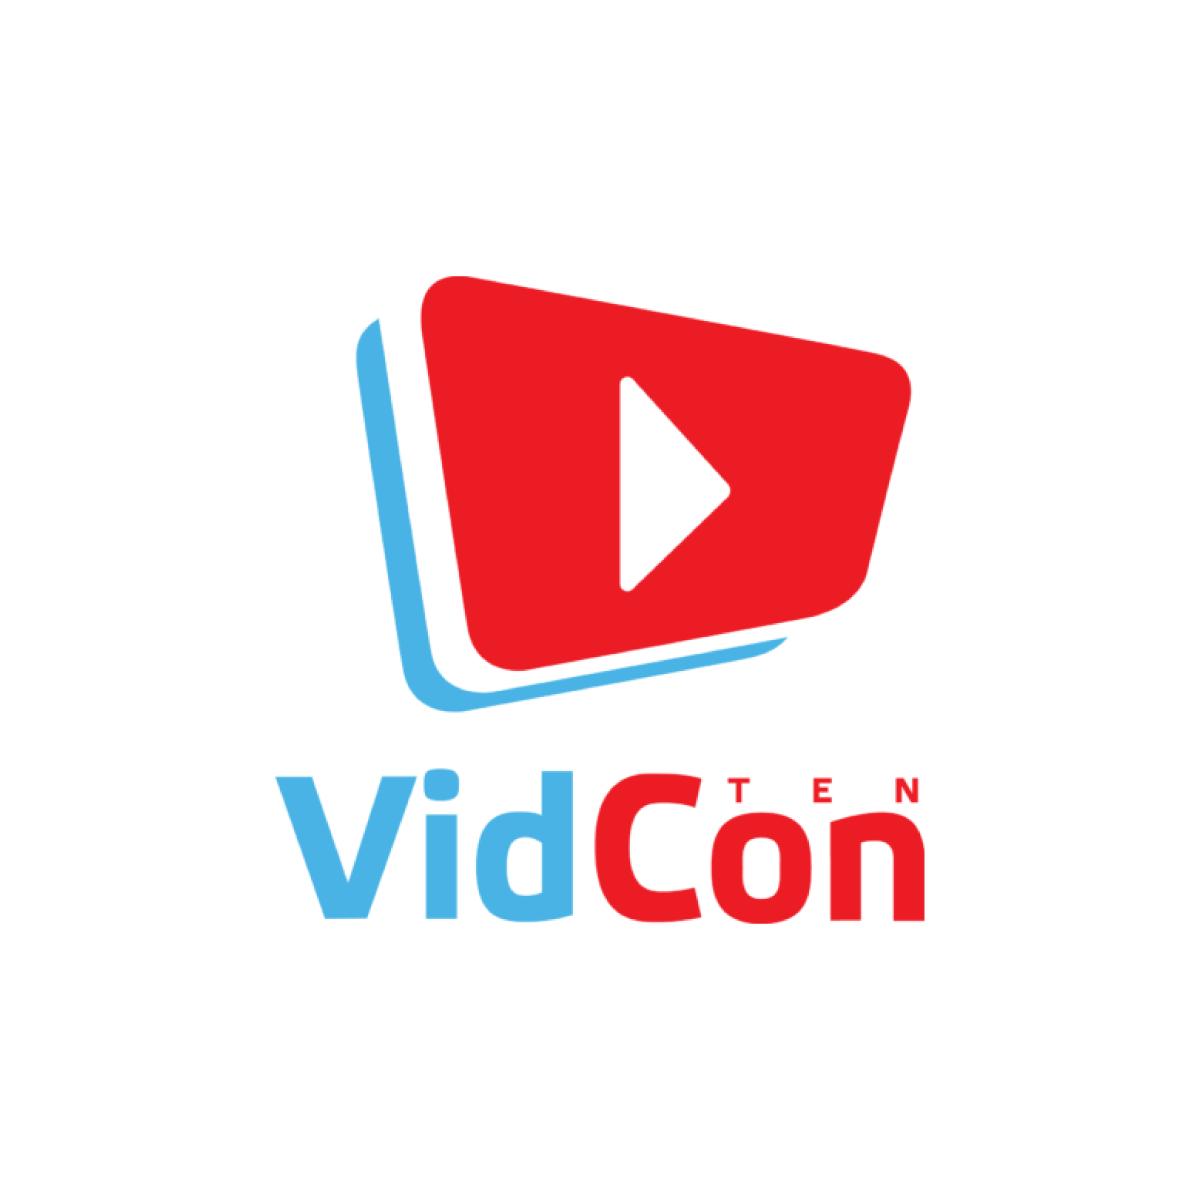 vidcon coupon 2019